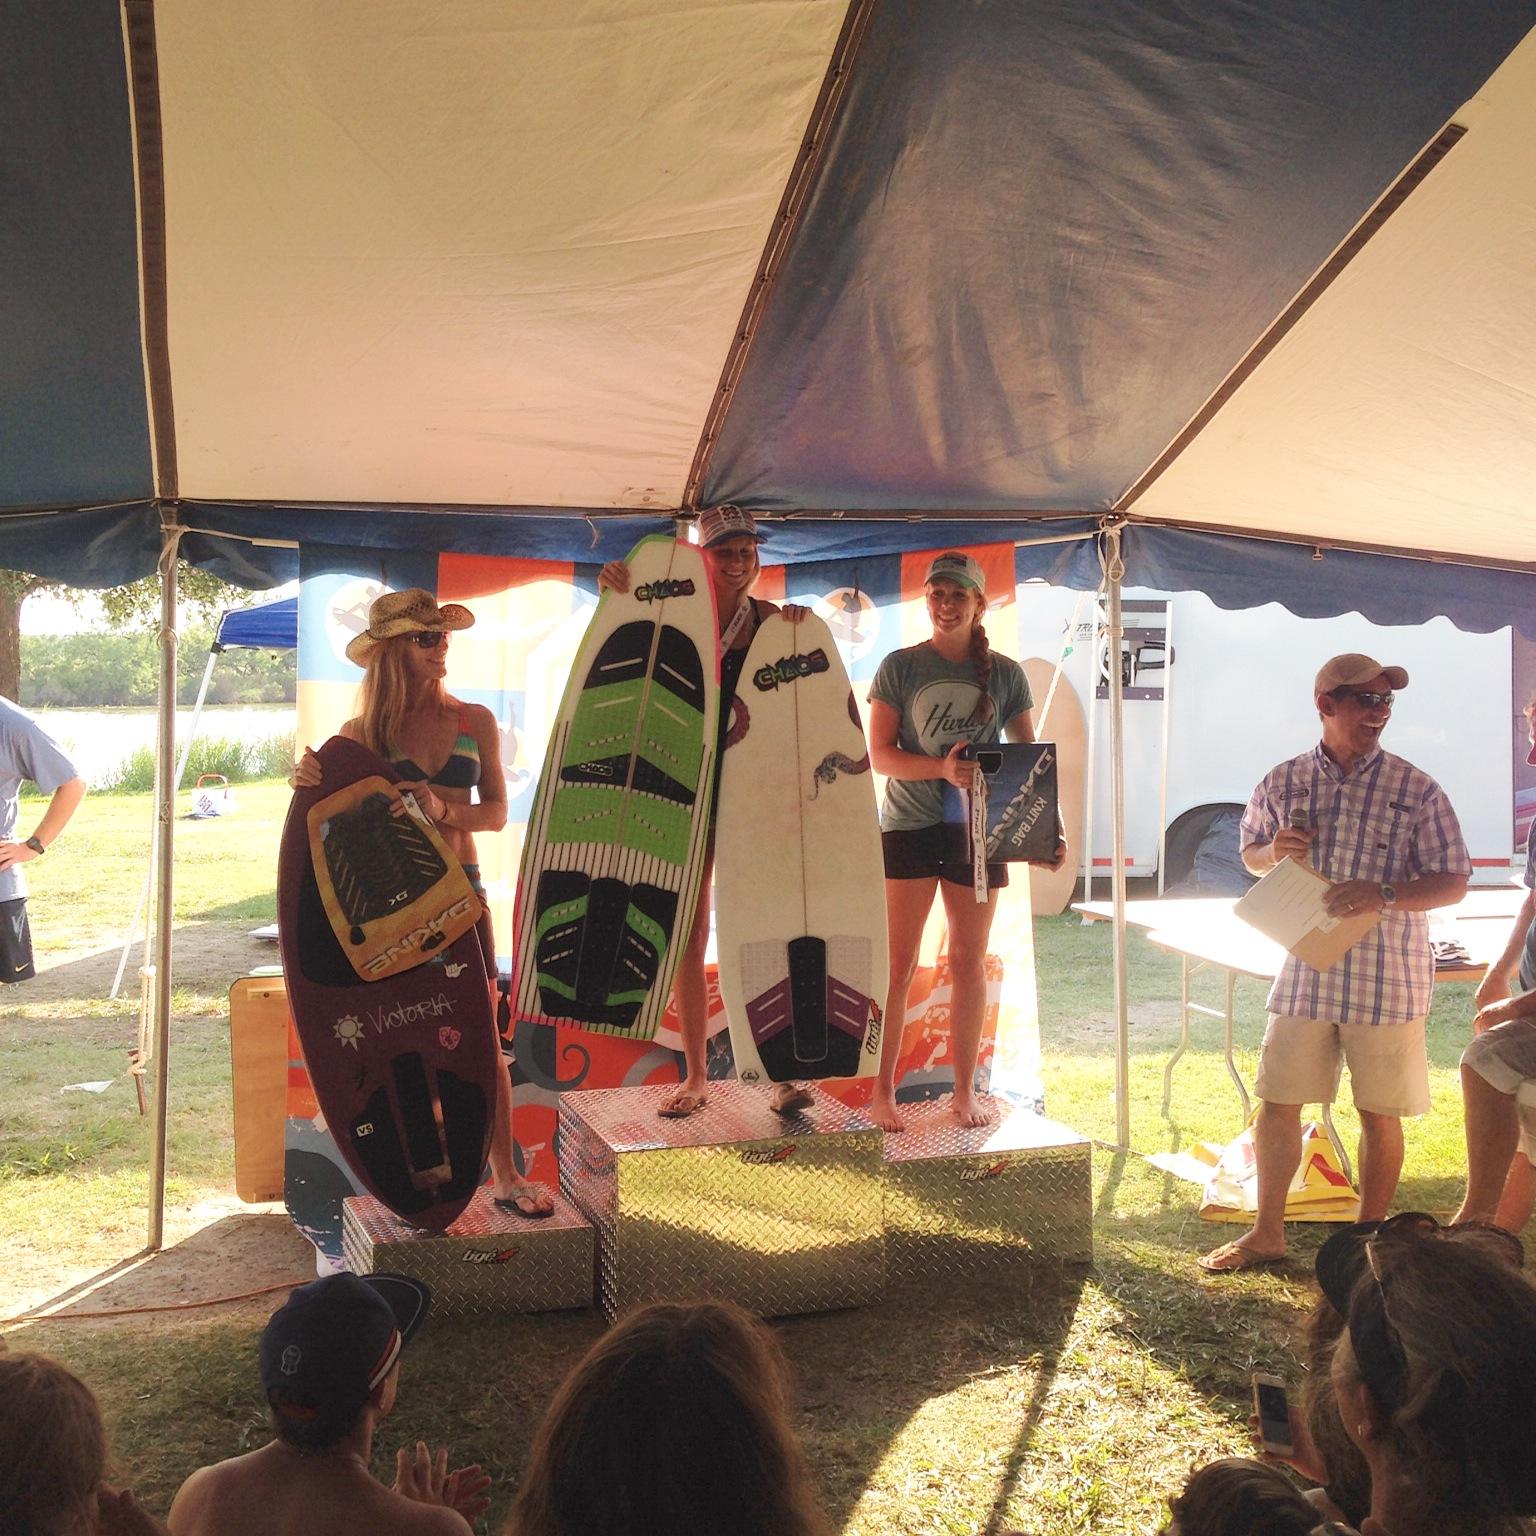 Women's Surf Podium. Team Rider Hana Darwin taking the win on her Chaos Contender.